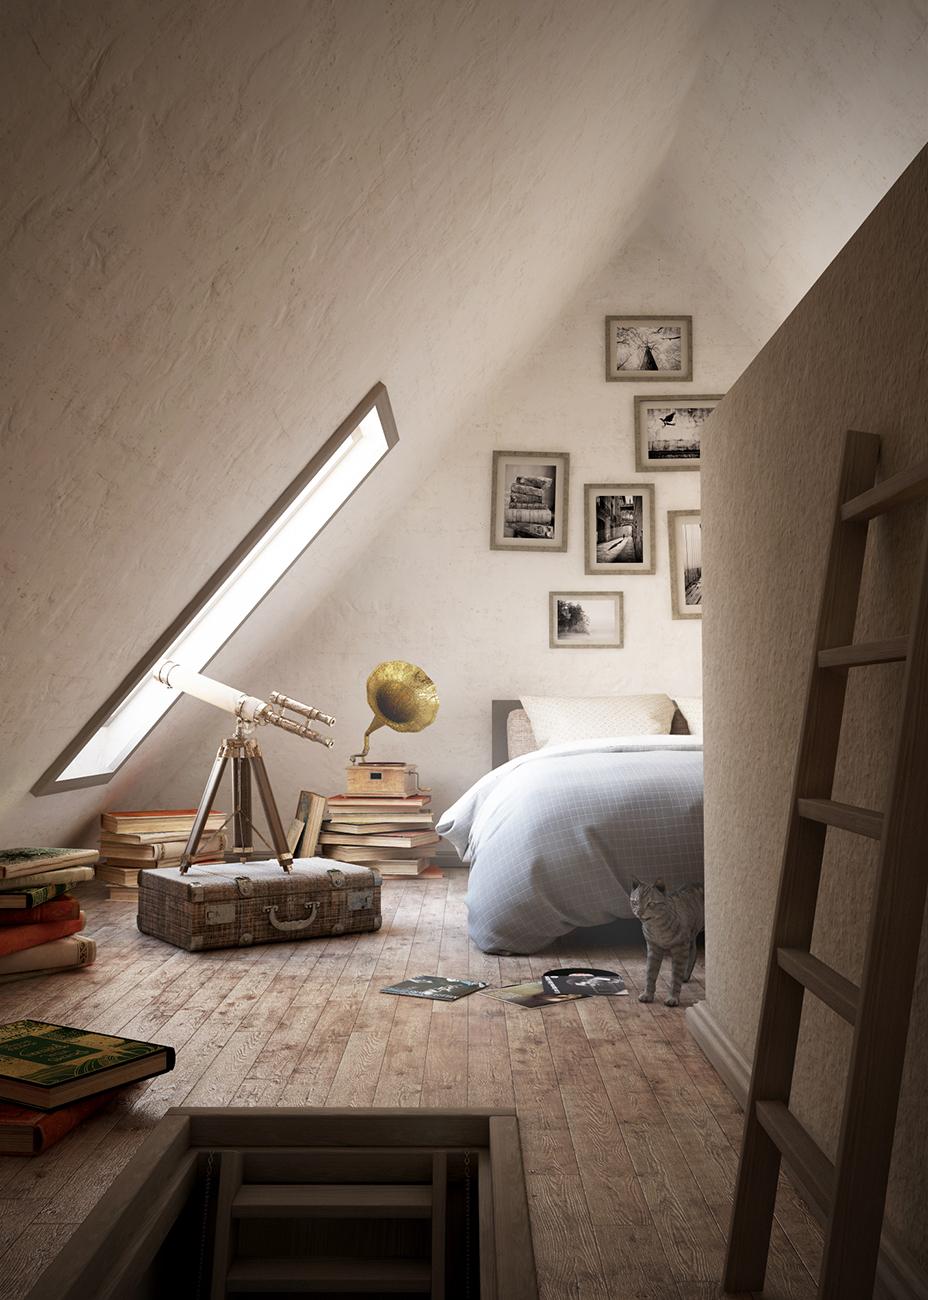 bedroom.jpg.fb3b23e8cb9c606d5d30eafec436cc8b.jpg